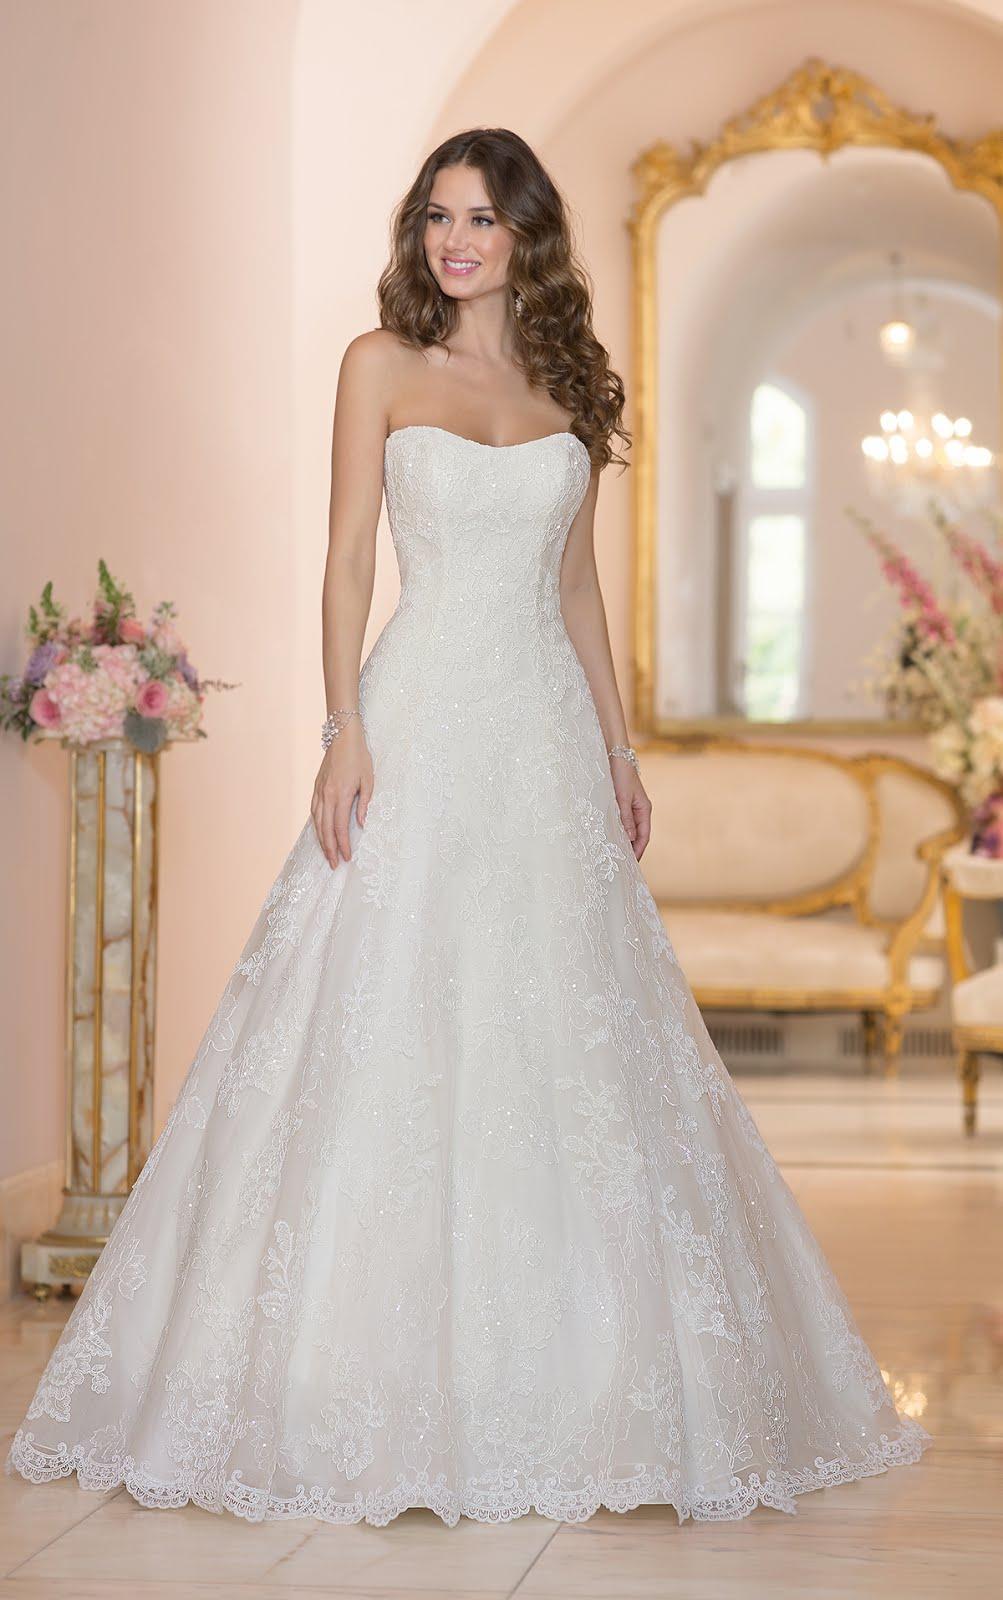 Brautkleid spitze ohne reifrock